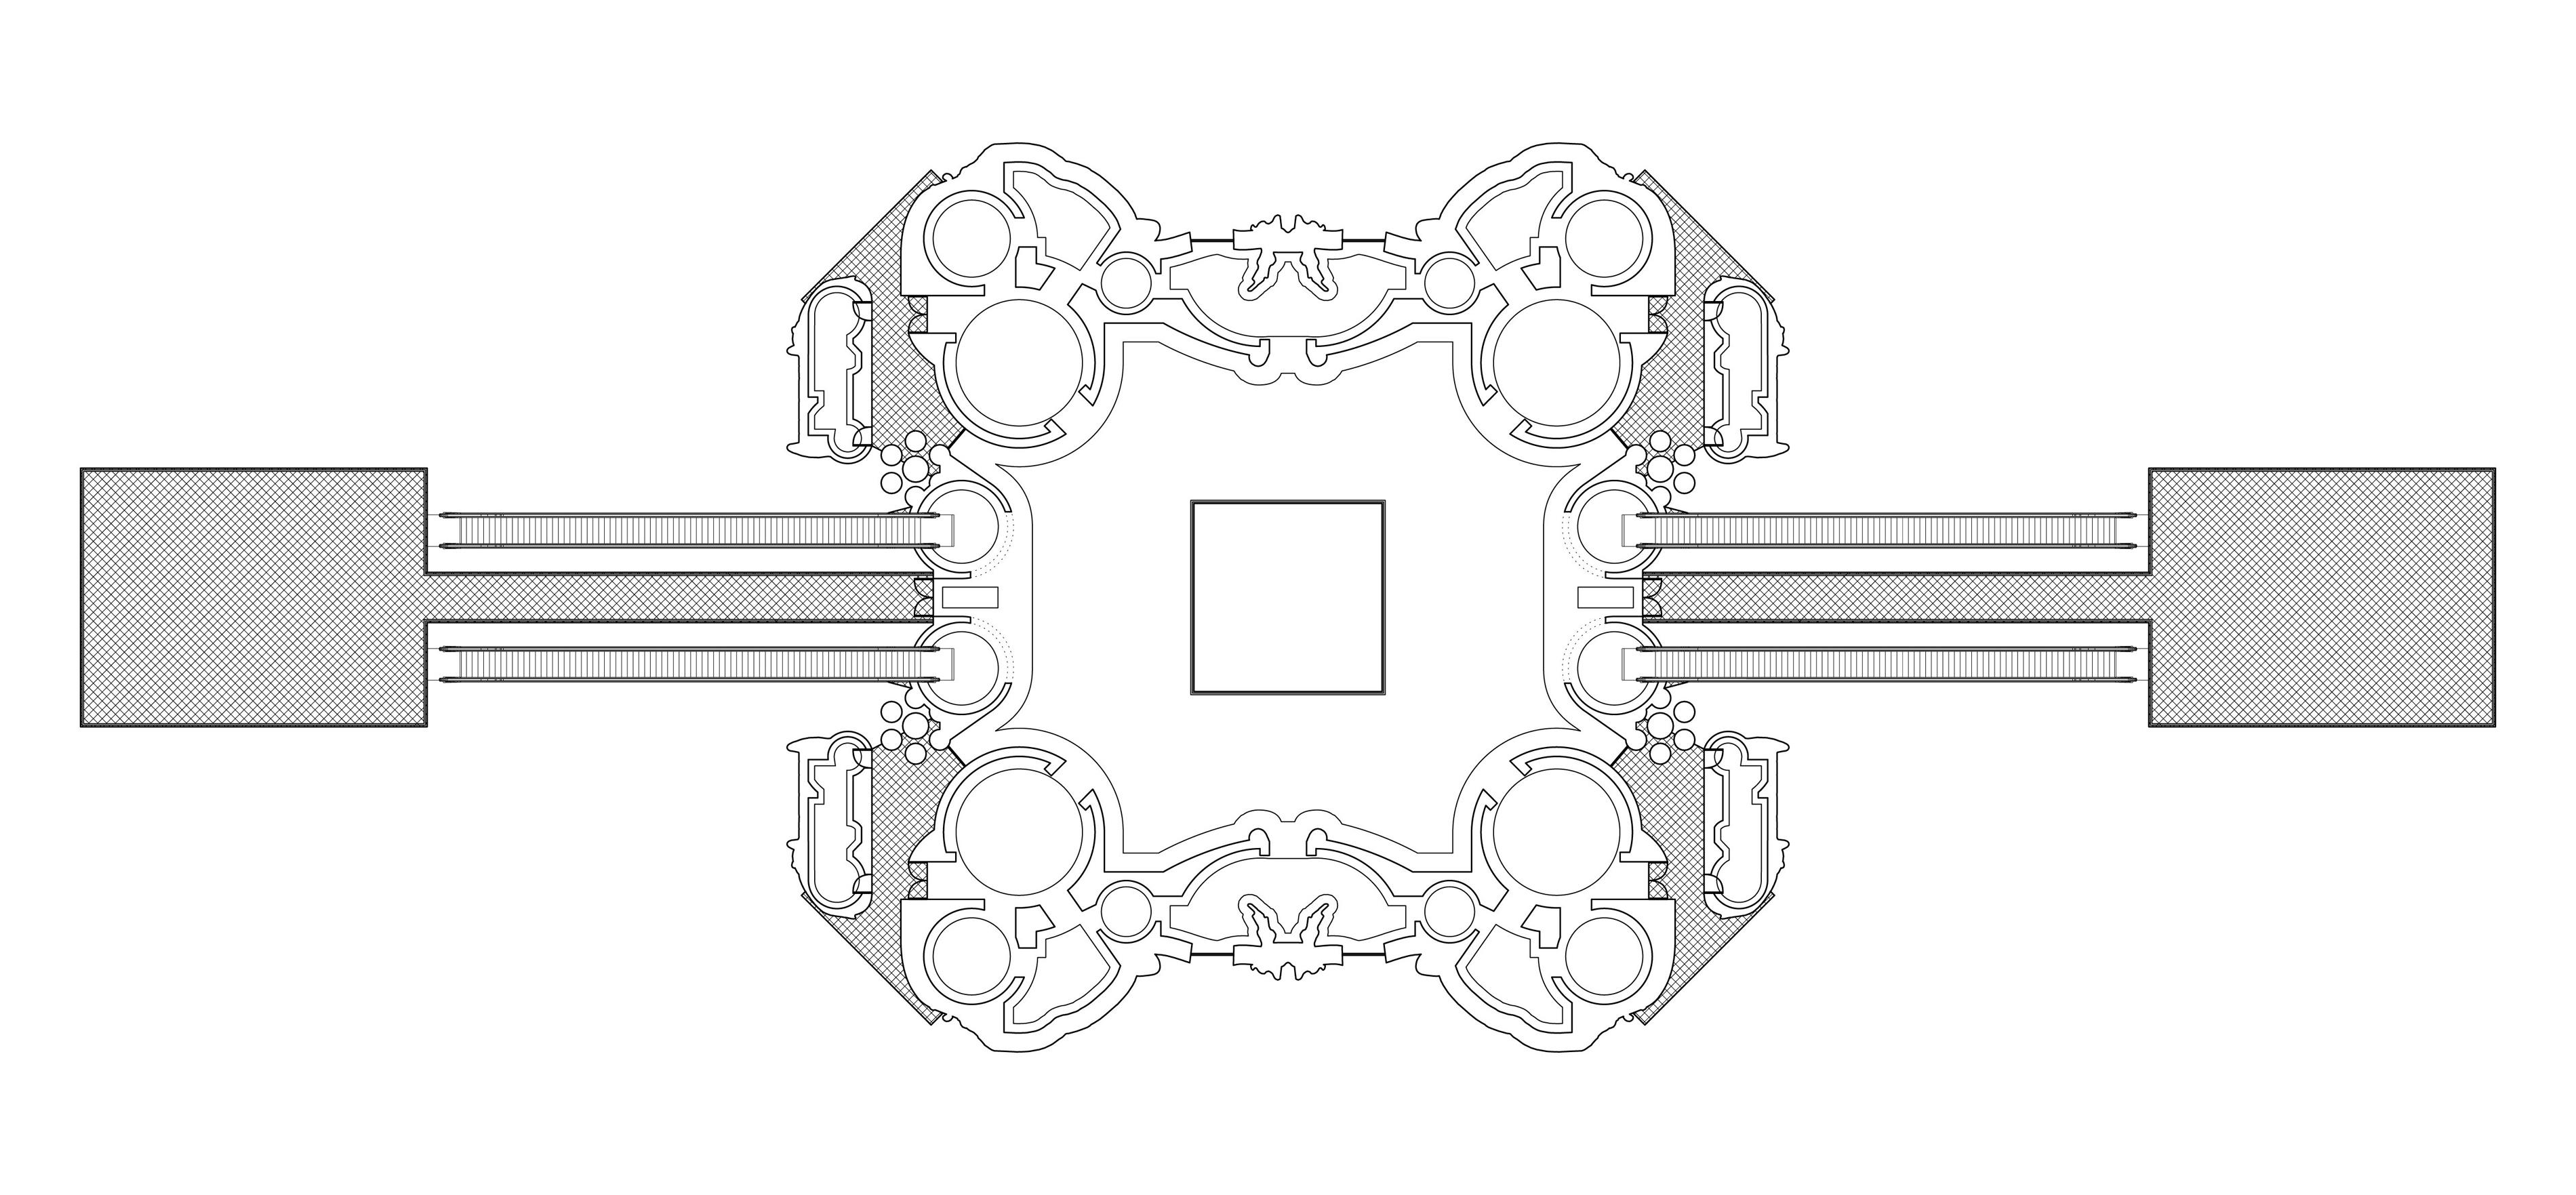 Chapter 01a Helsinki Guggenheim drawing plan 01 DONE_1